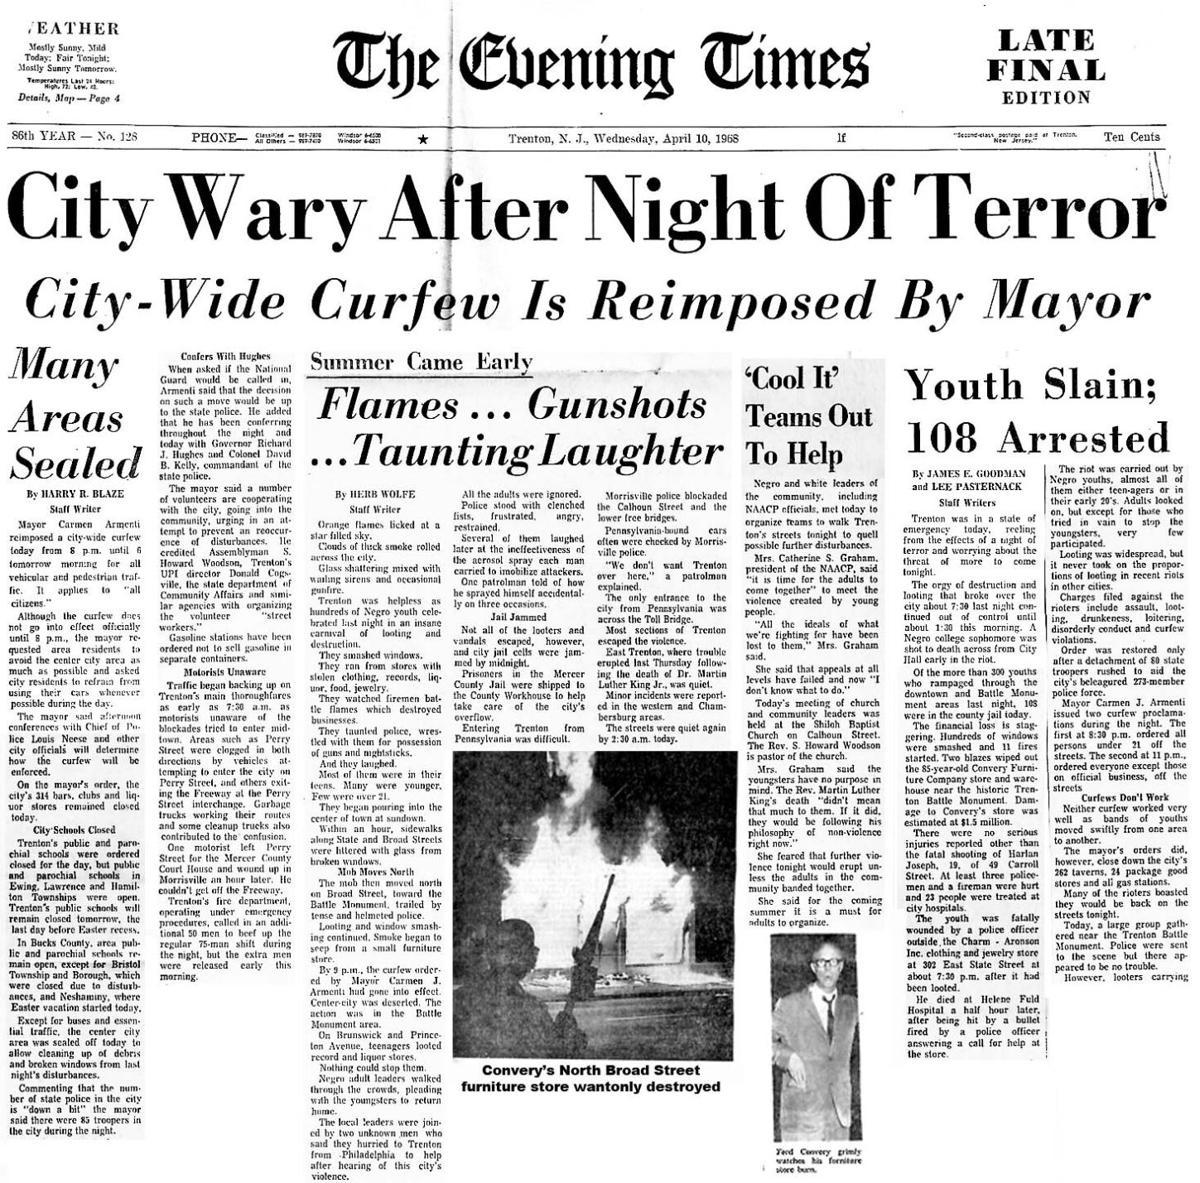 1968 APRIL 10 TRENTON DESTROYED